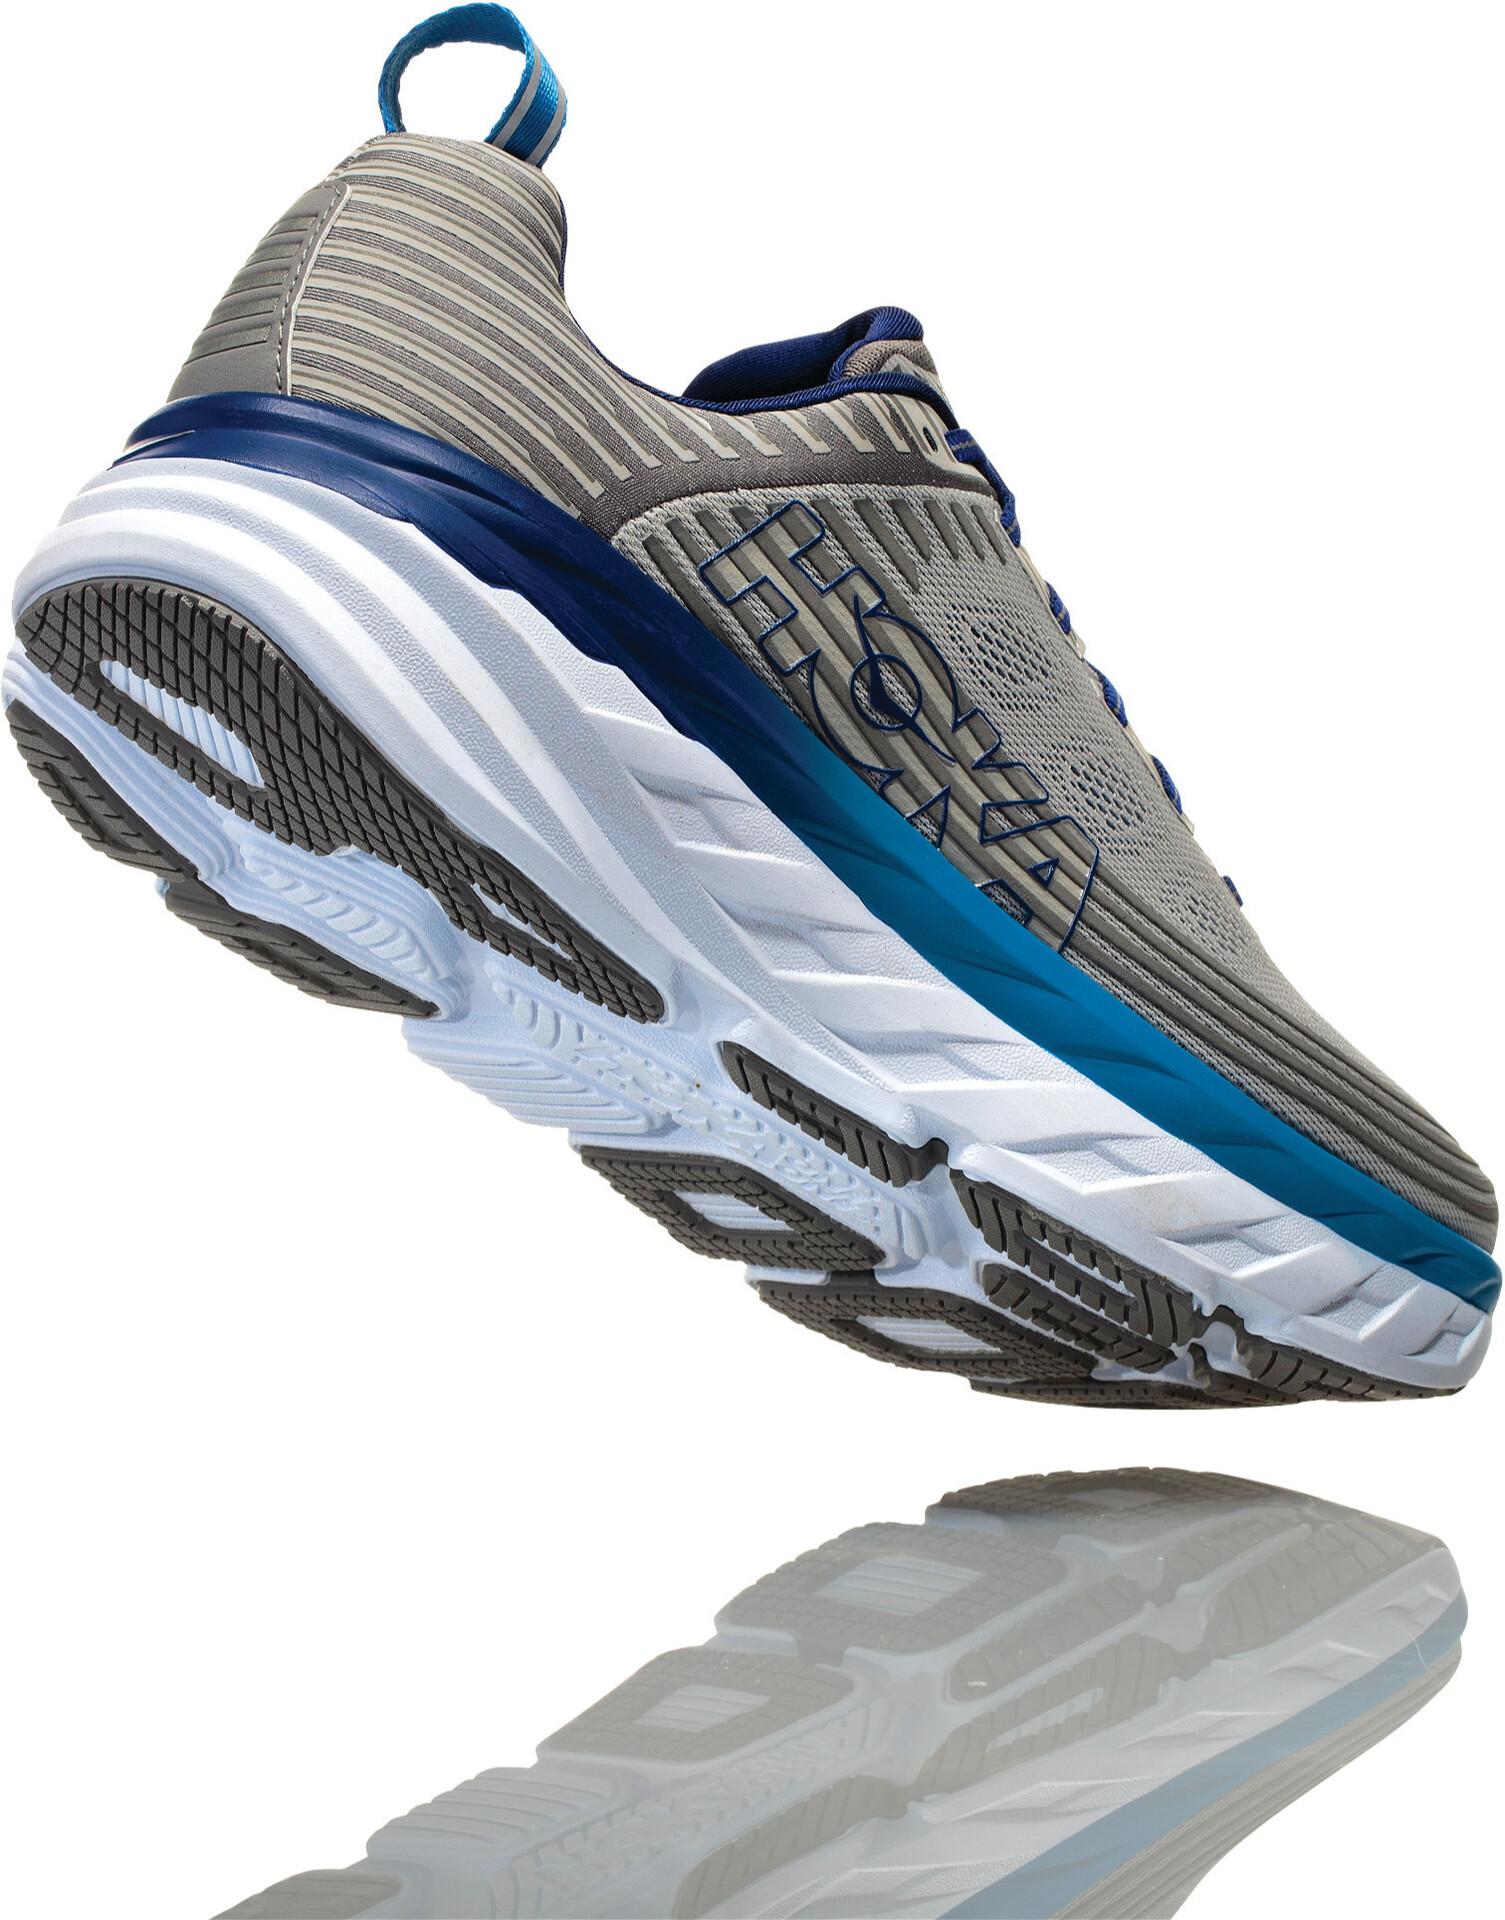 Hoka One One Bondi 6 Running Shoes Herre vapor bluefrost gray